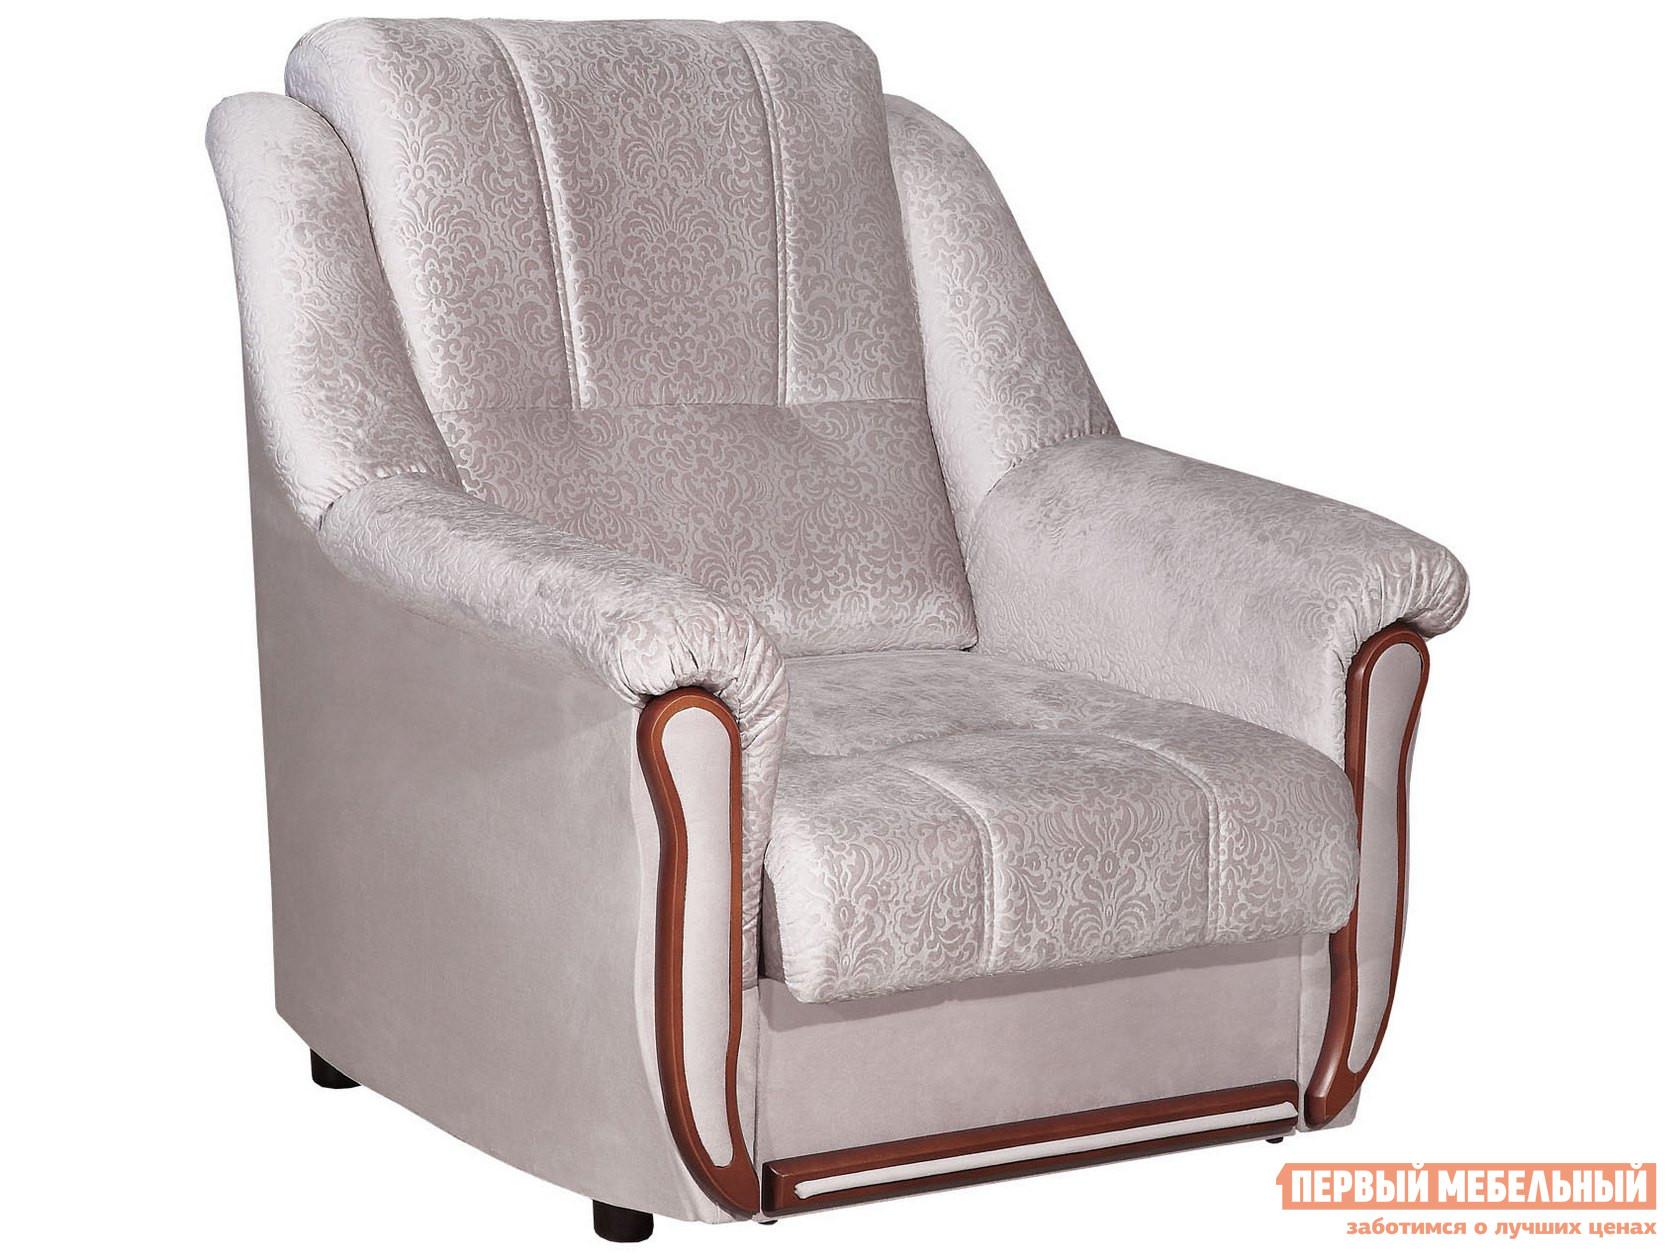 Кресло  Кресло Диана Серый, велюр — Кресло Диана Серый, велюр